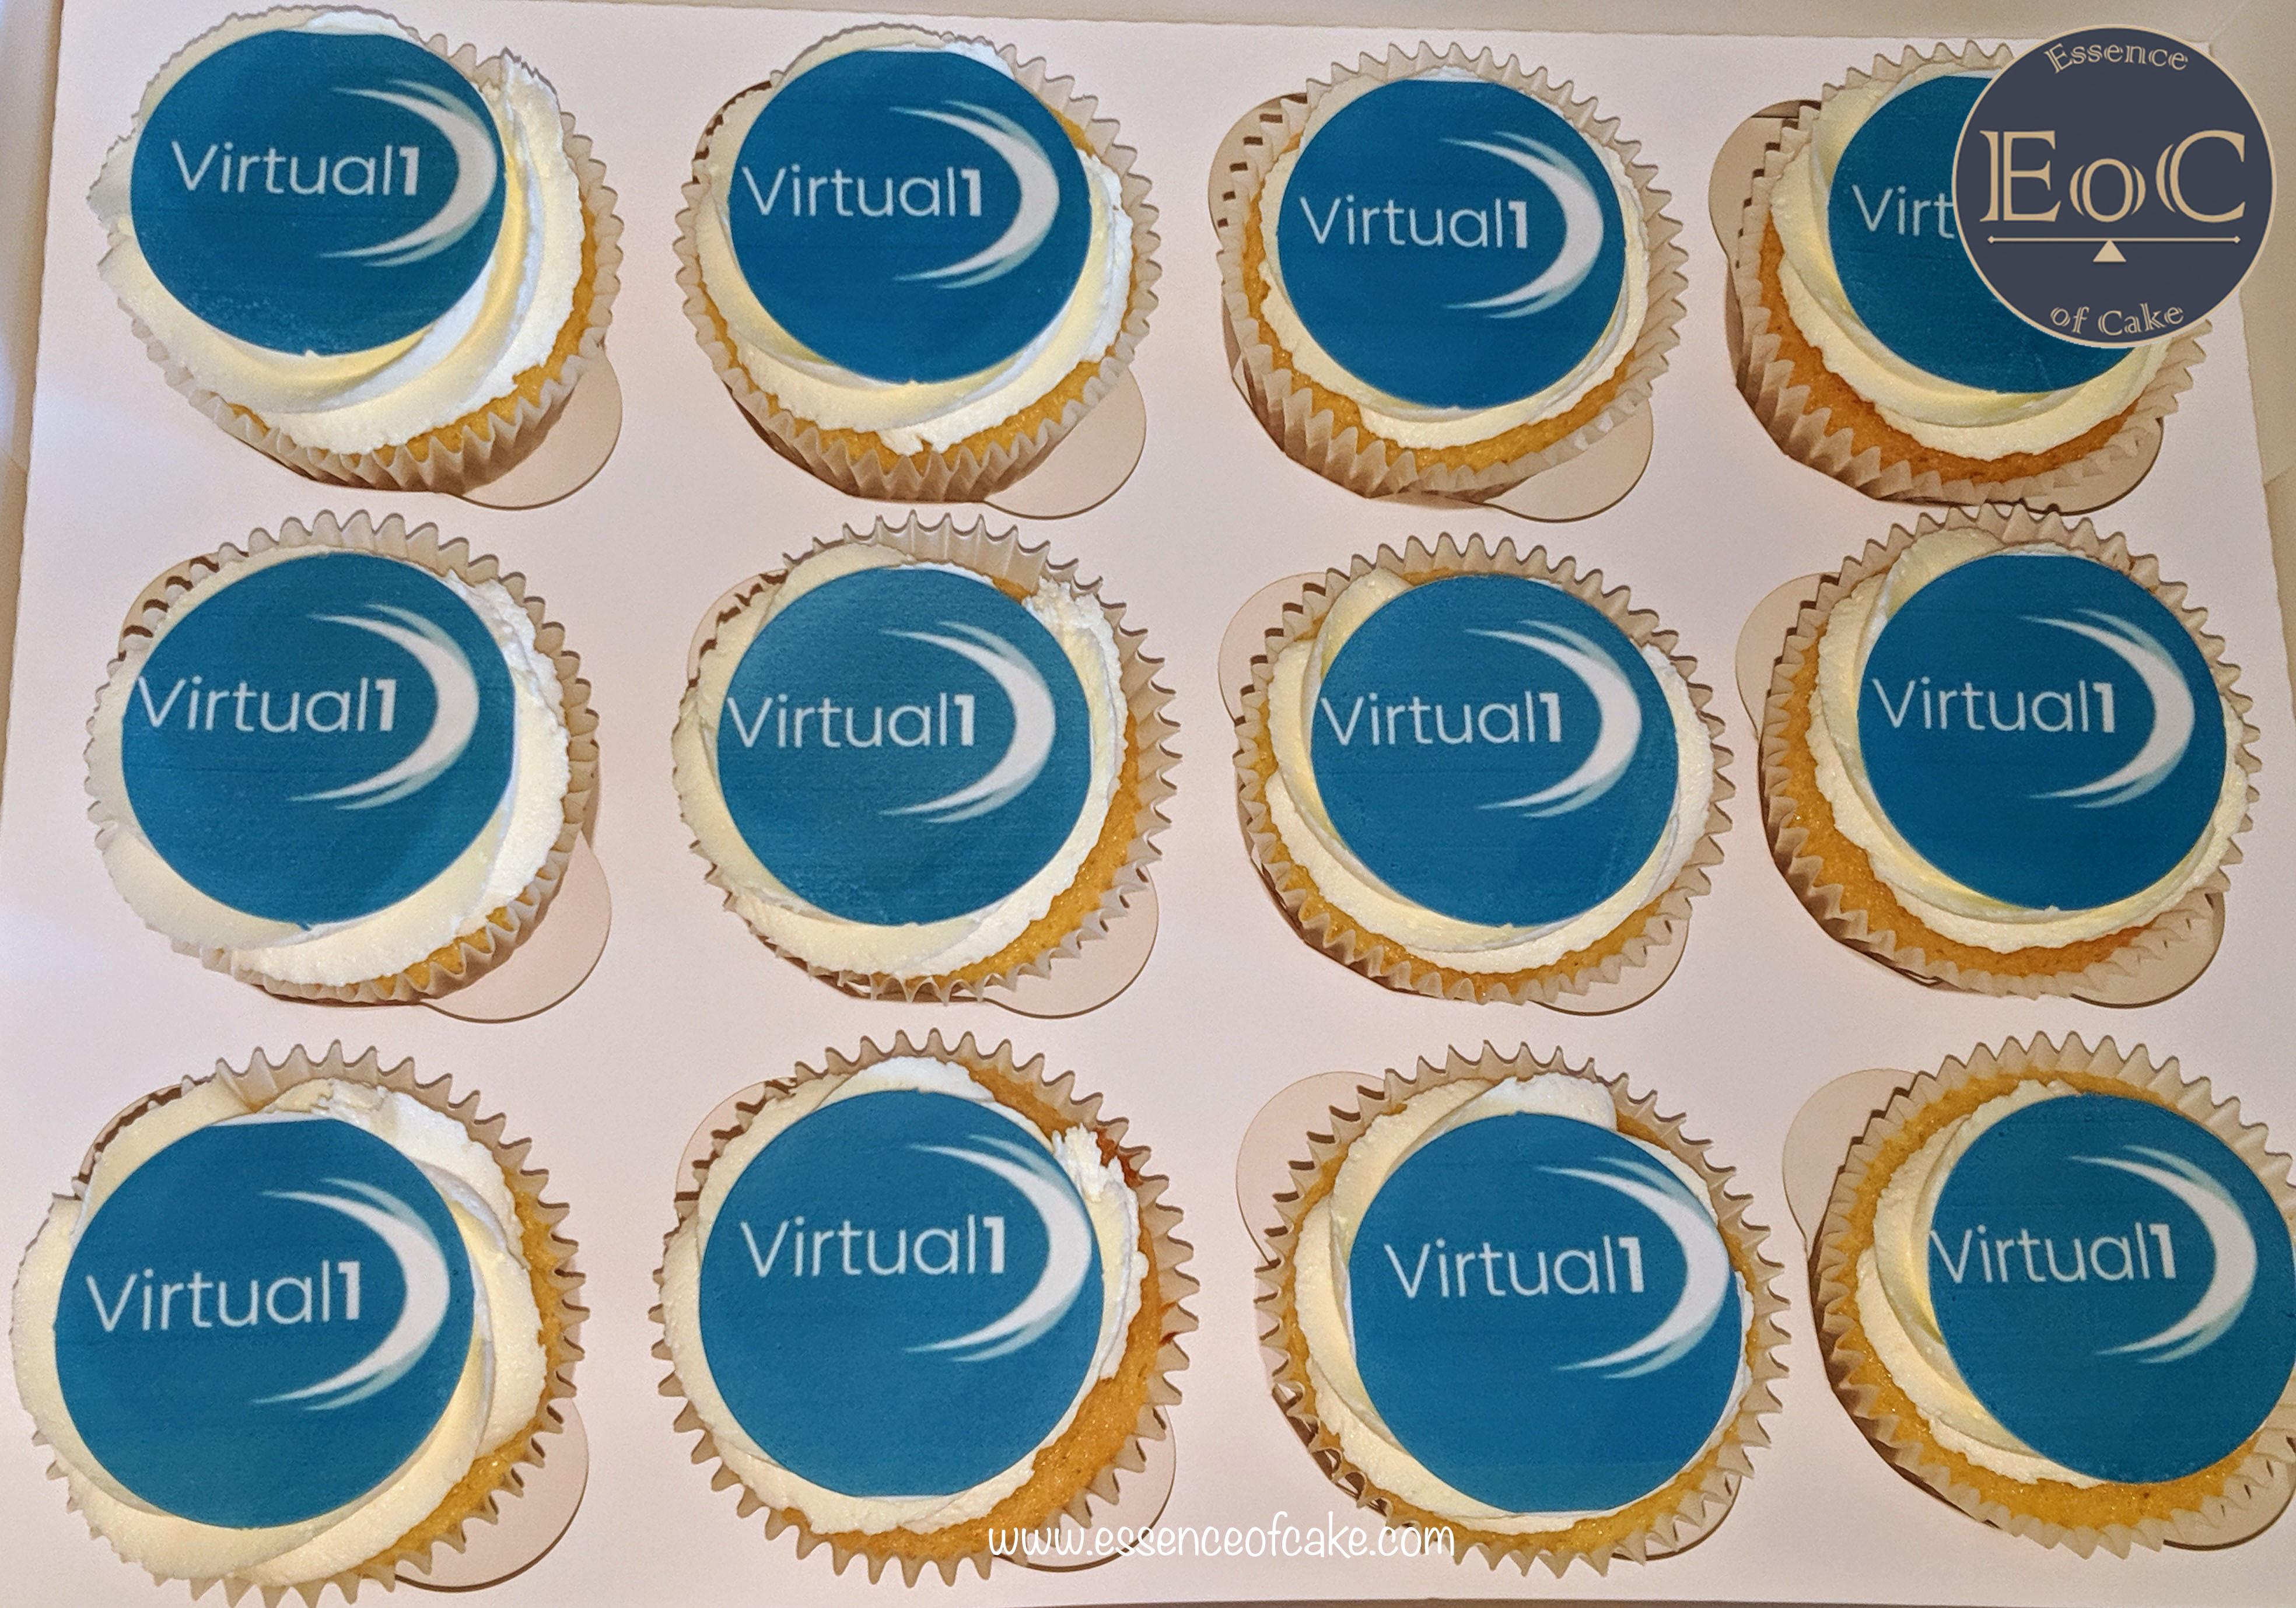 Corporate Virtual1